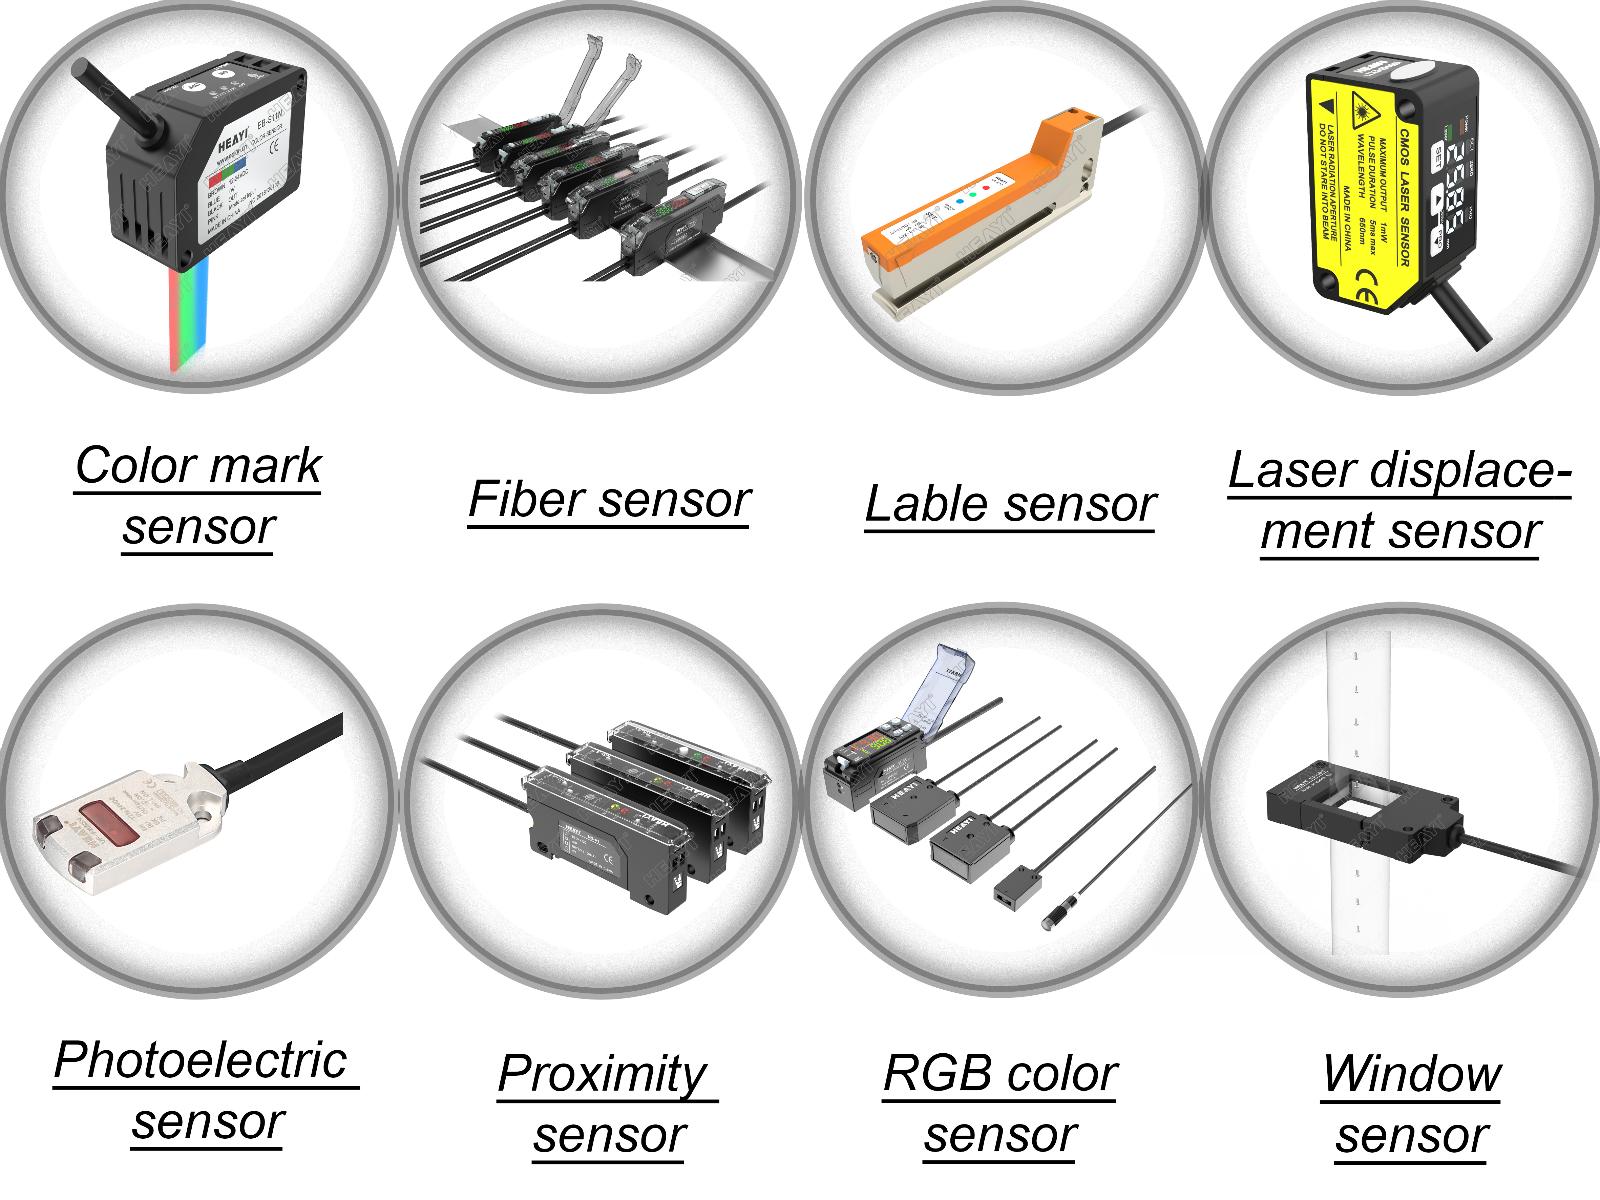 product-Heyi-Heyi L shape photo beam sensor UE-L45 Infrared photoelectric proximity sensor-img-2